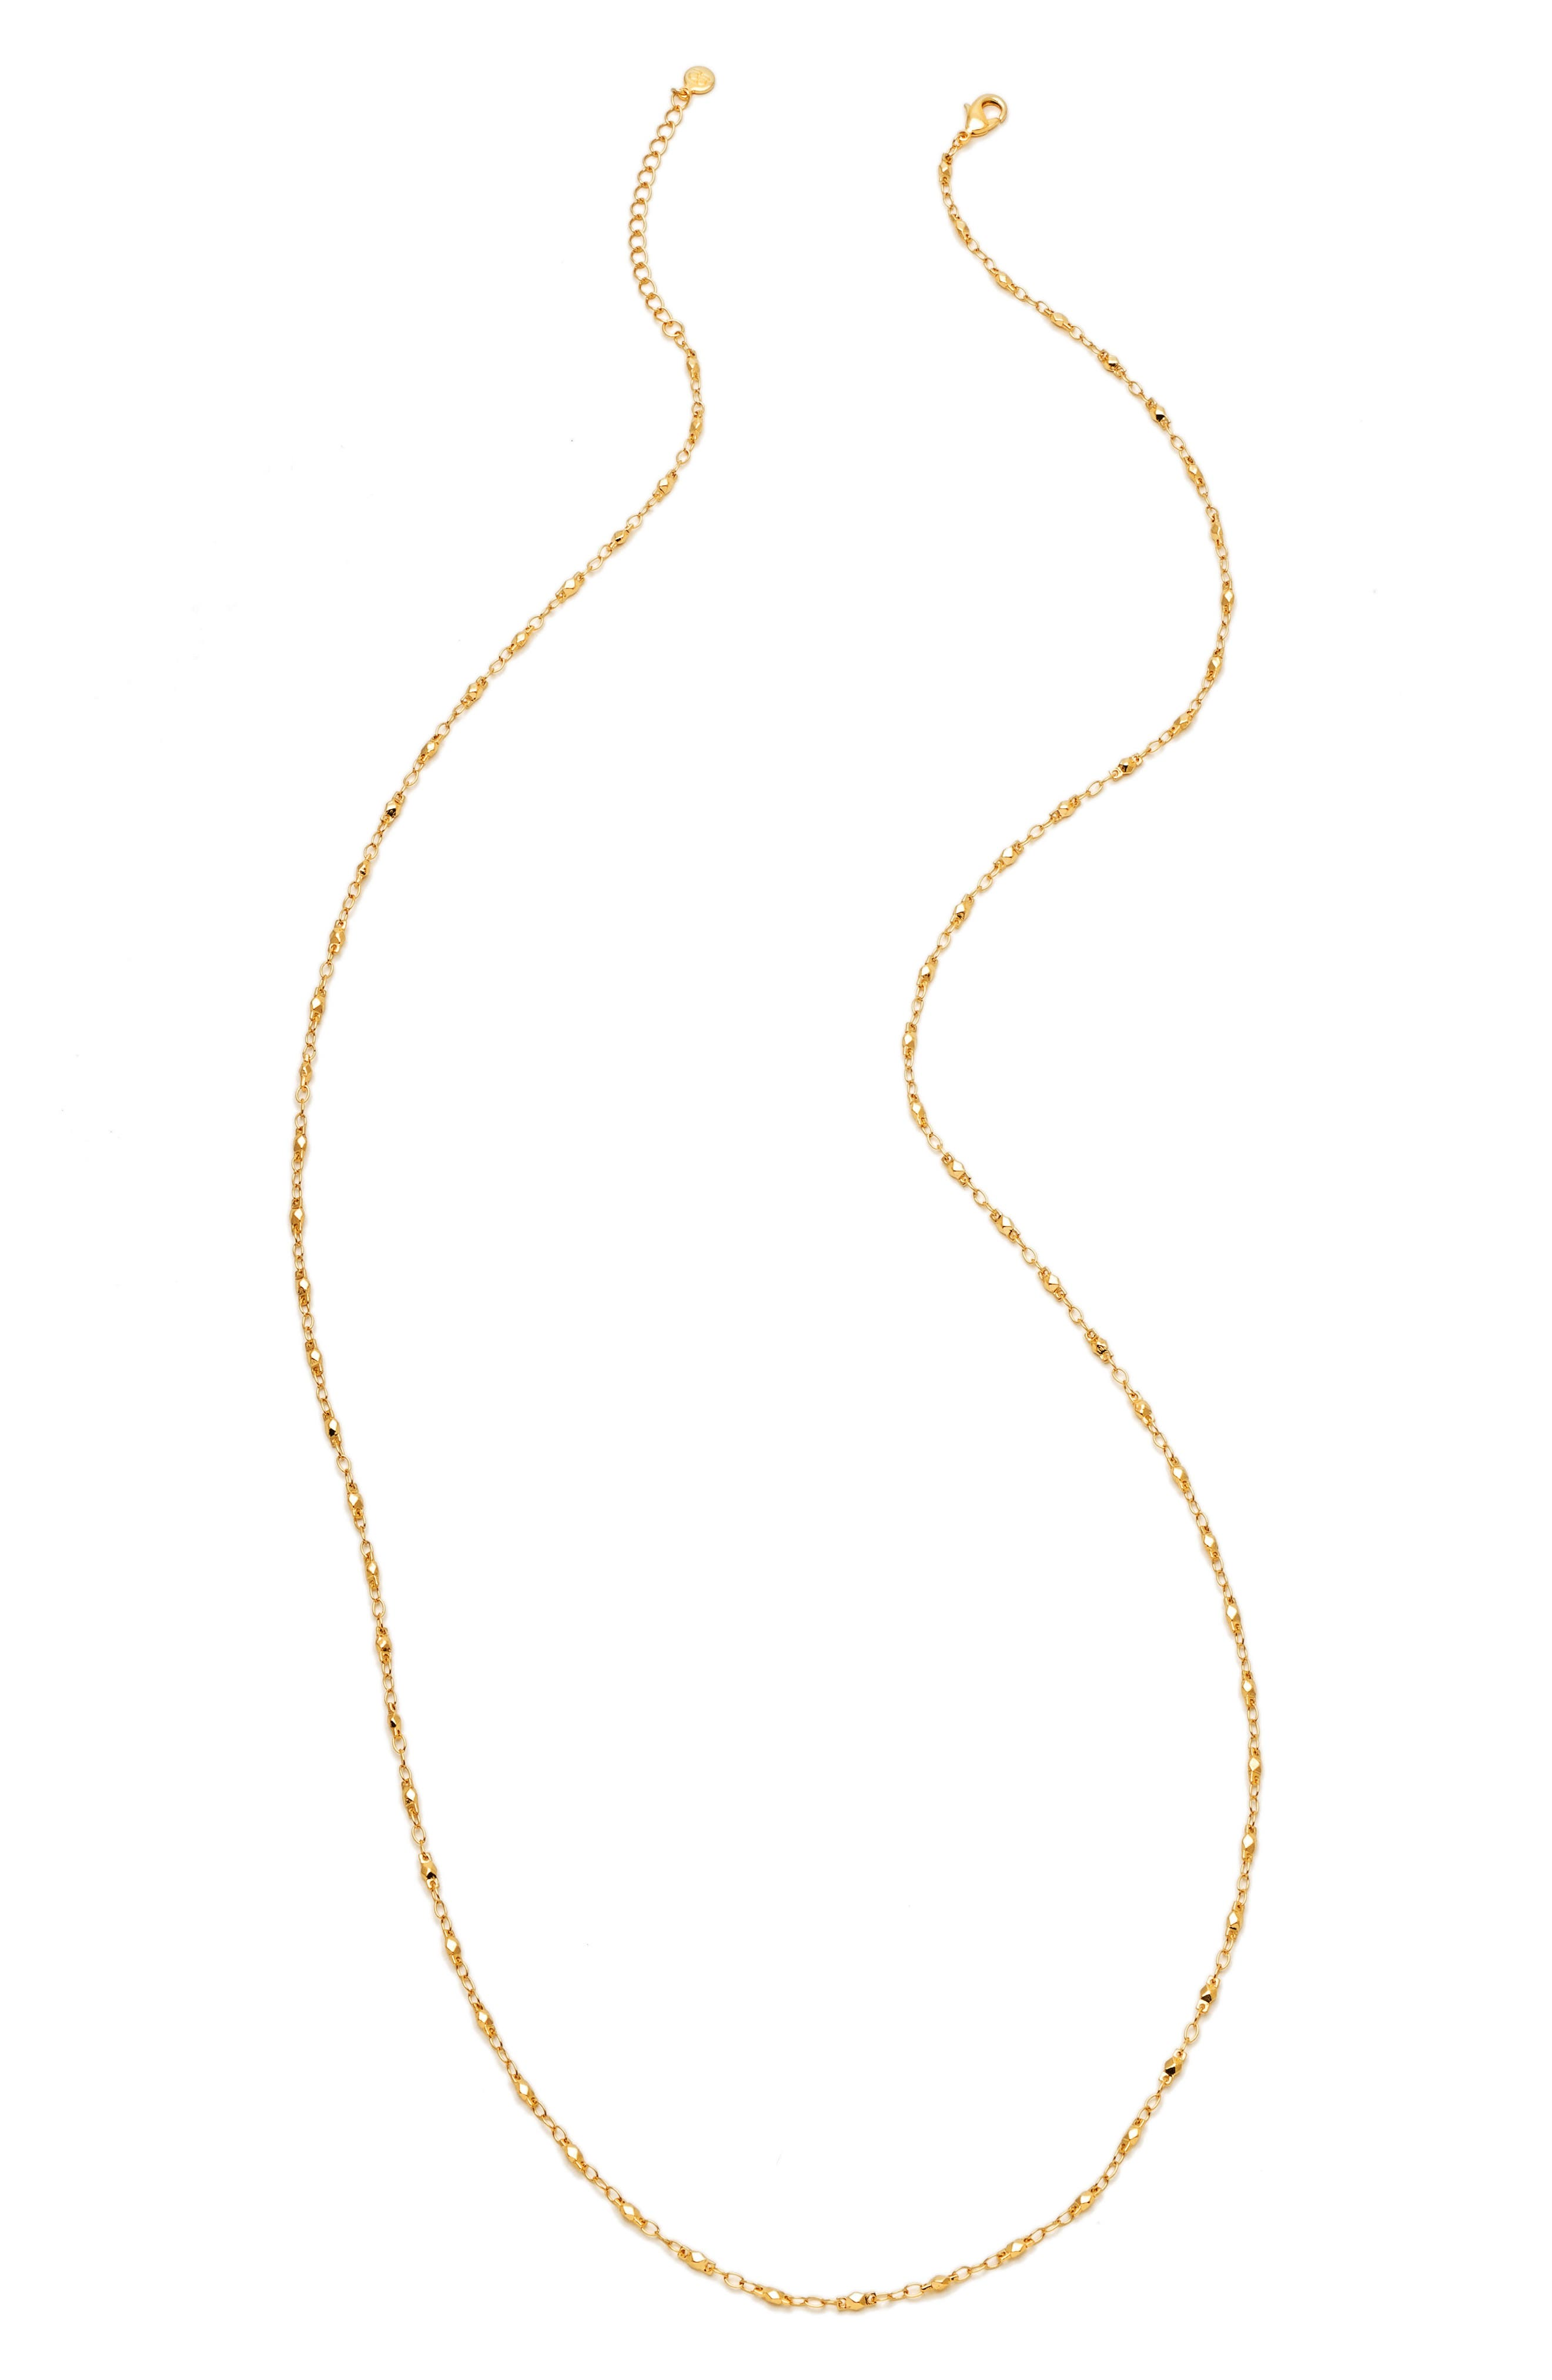 Alternate Image 1 Selected - gorjana Multistrand Beaded Necklace